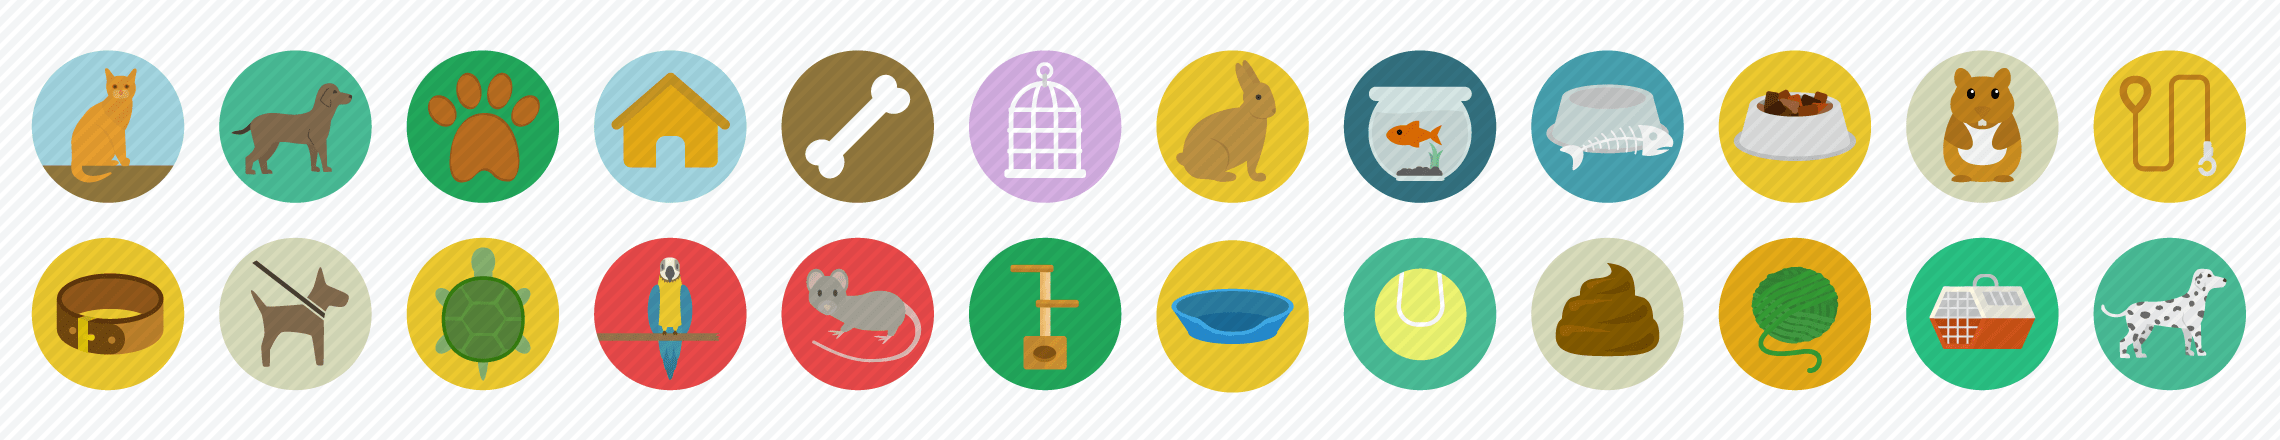 Pets_Flat_Icons